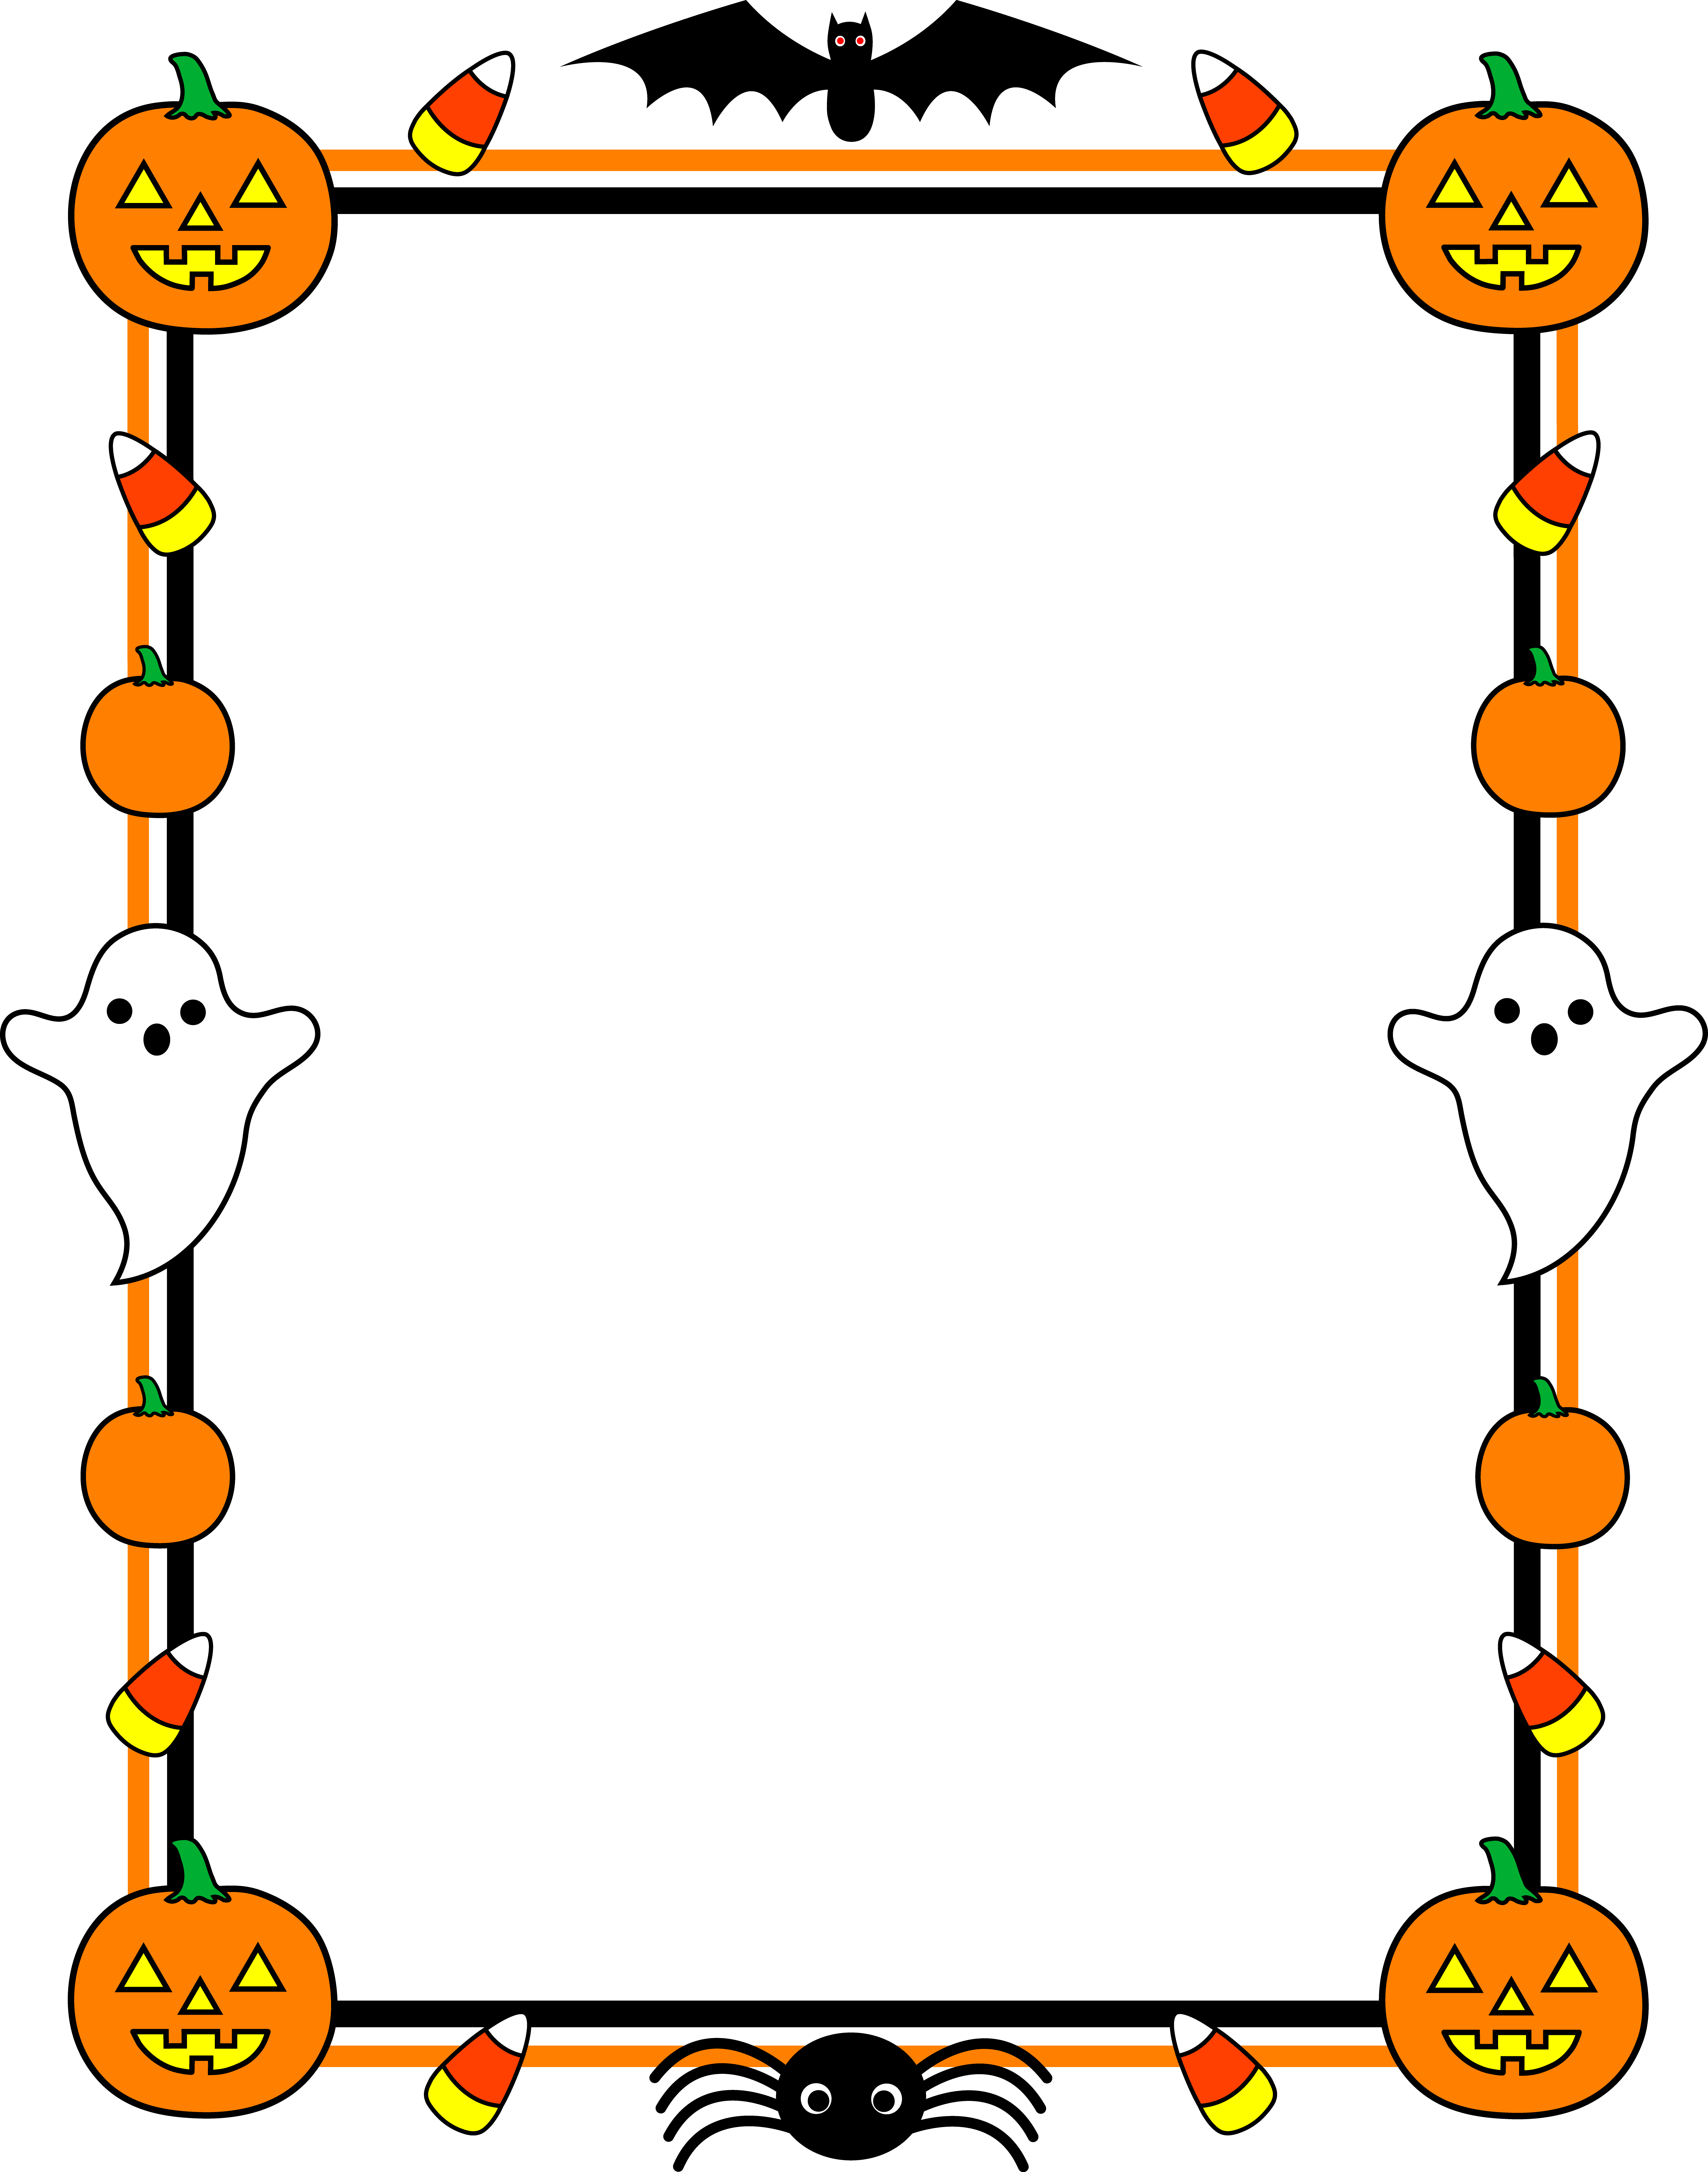 16 Halloween Clip Art Designs Images